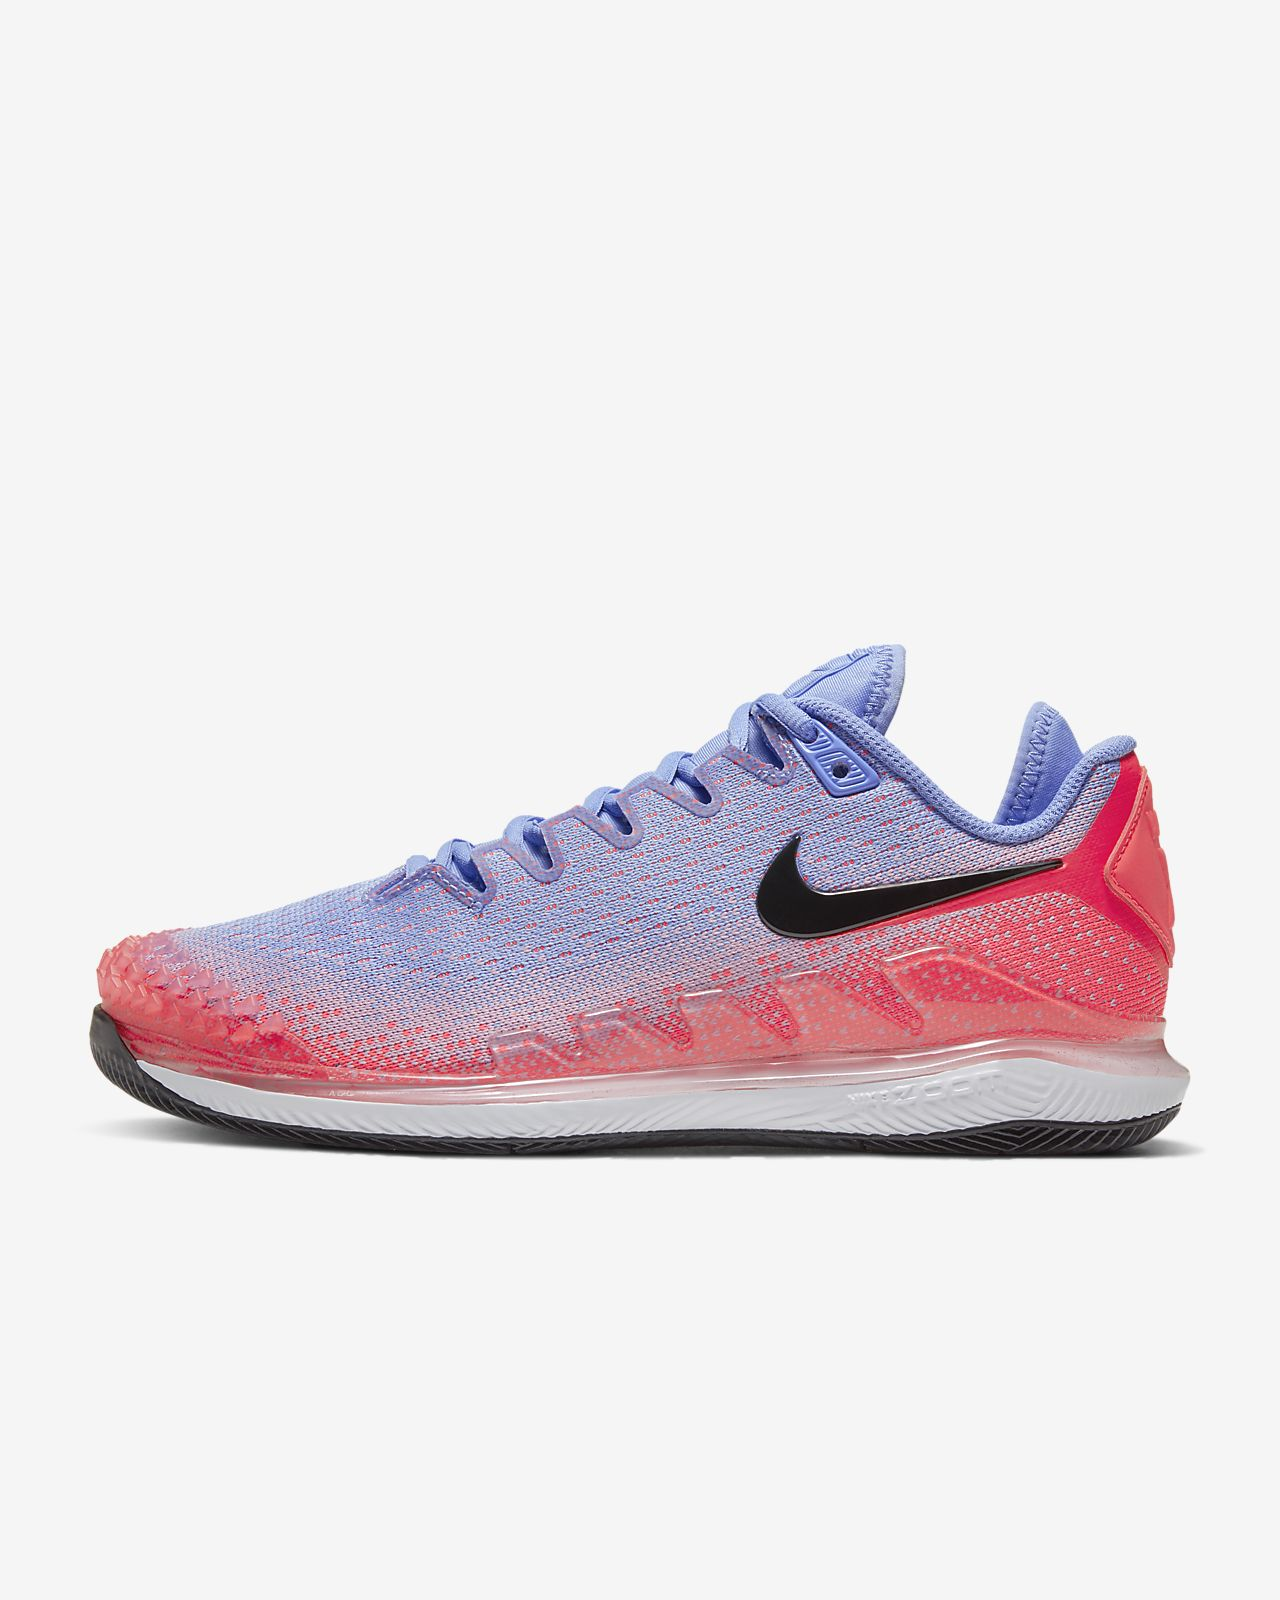 Nike Air Zoom Pulse Nike News